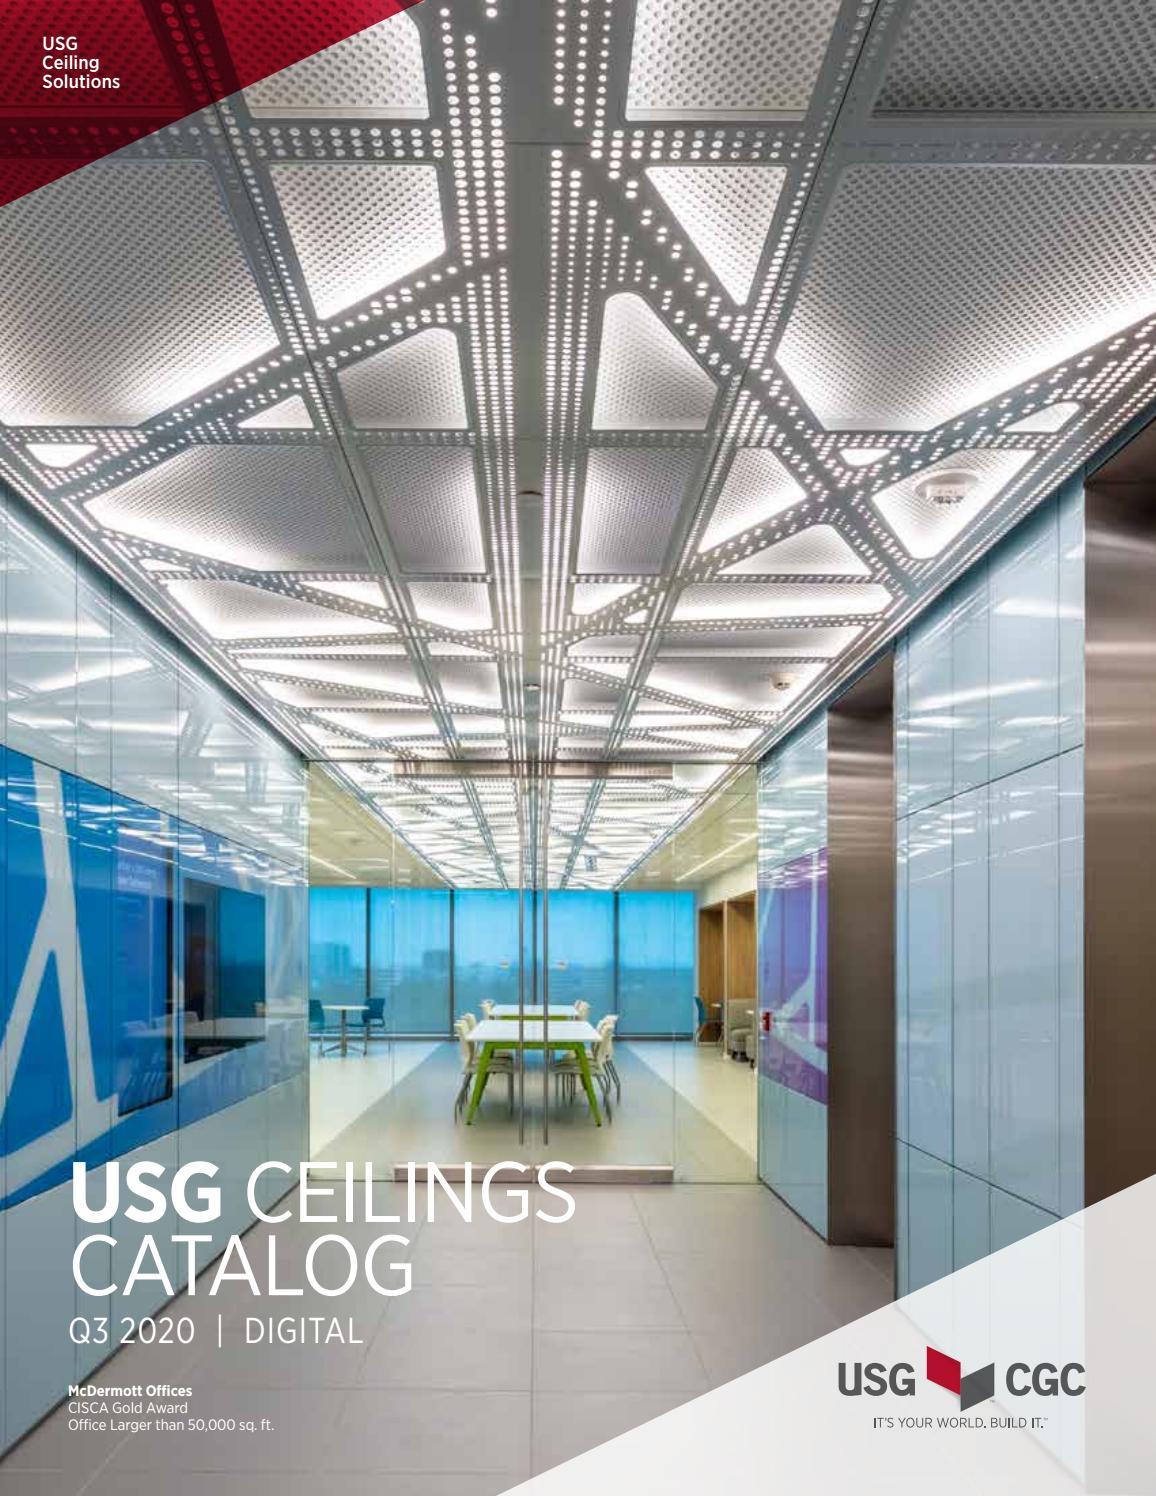 usg cgc ceilings catalog sc2000 by